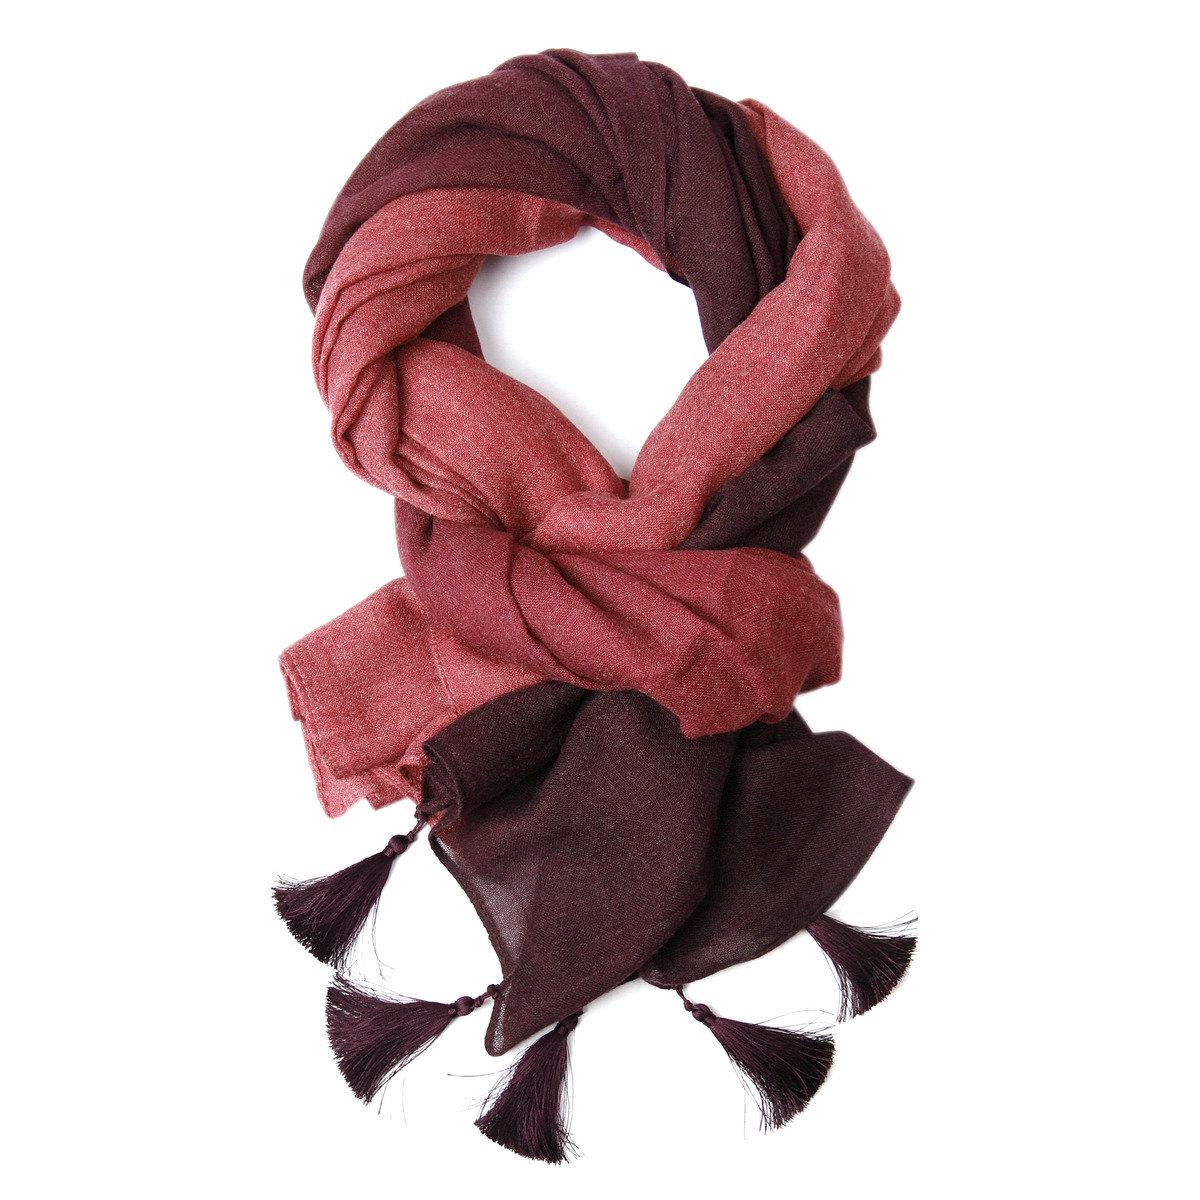 rug & tail_02 圍巾